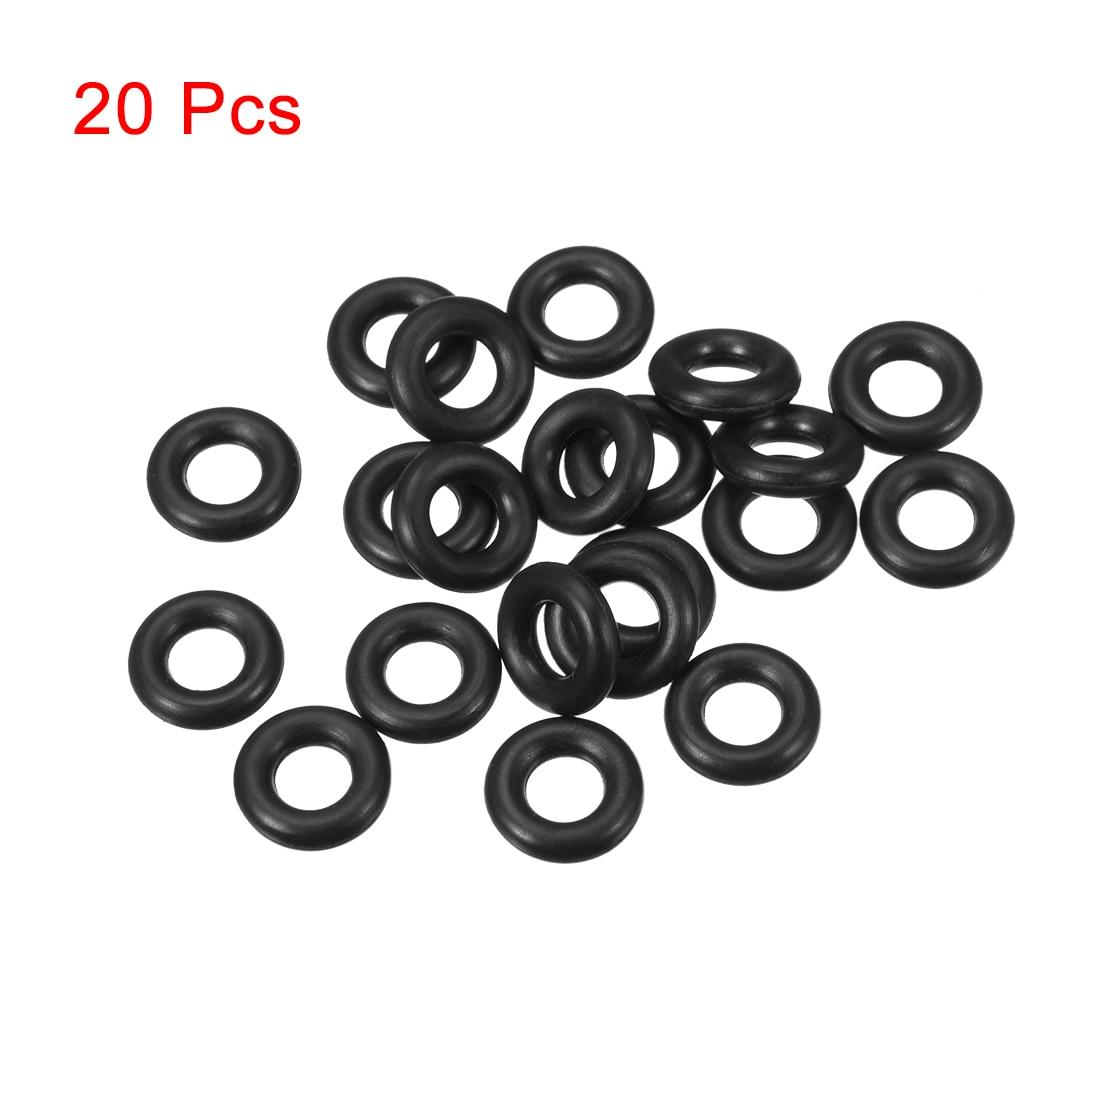 100pcs//lot 4mm Rubber Oil Seal O Ring Sealing Gasket Washers O Shaped Rings